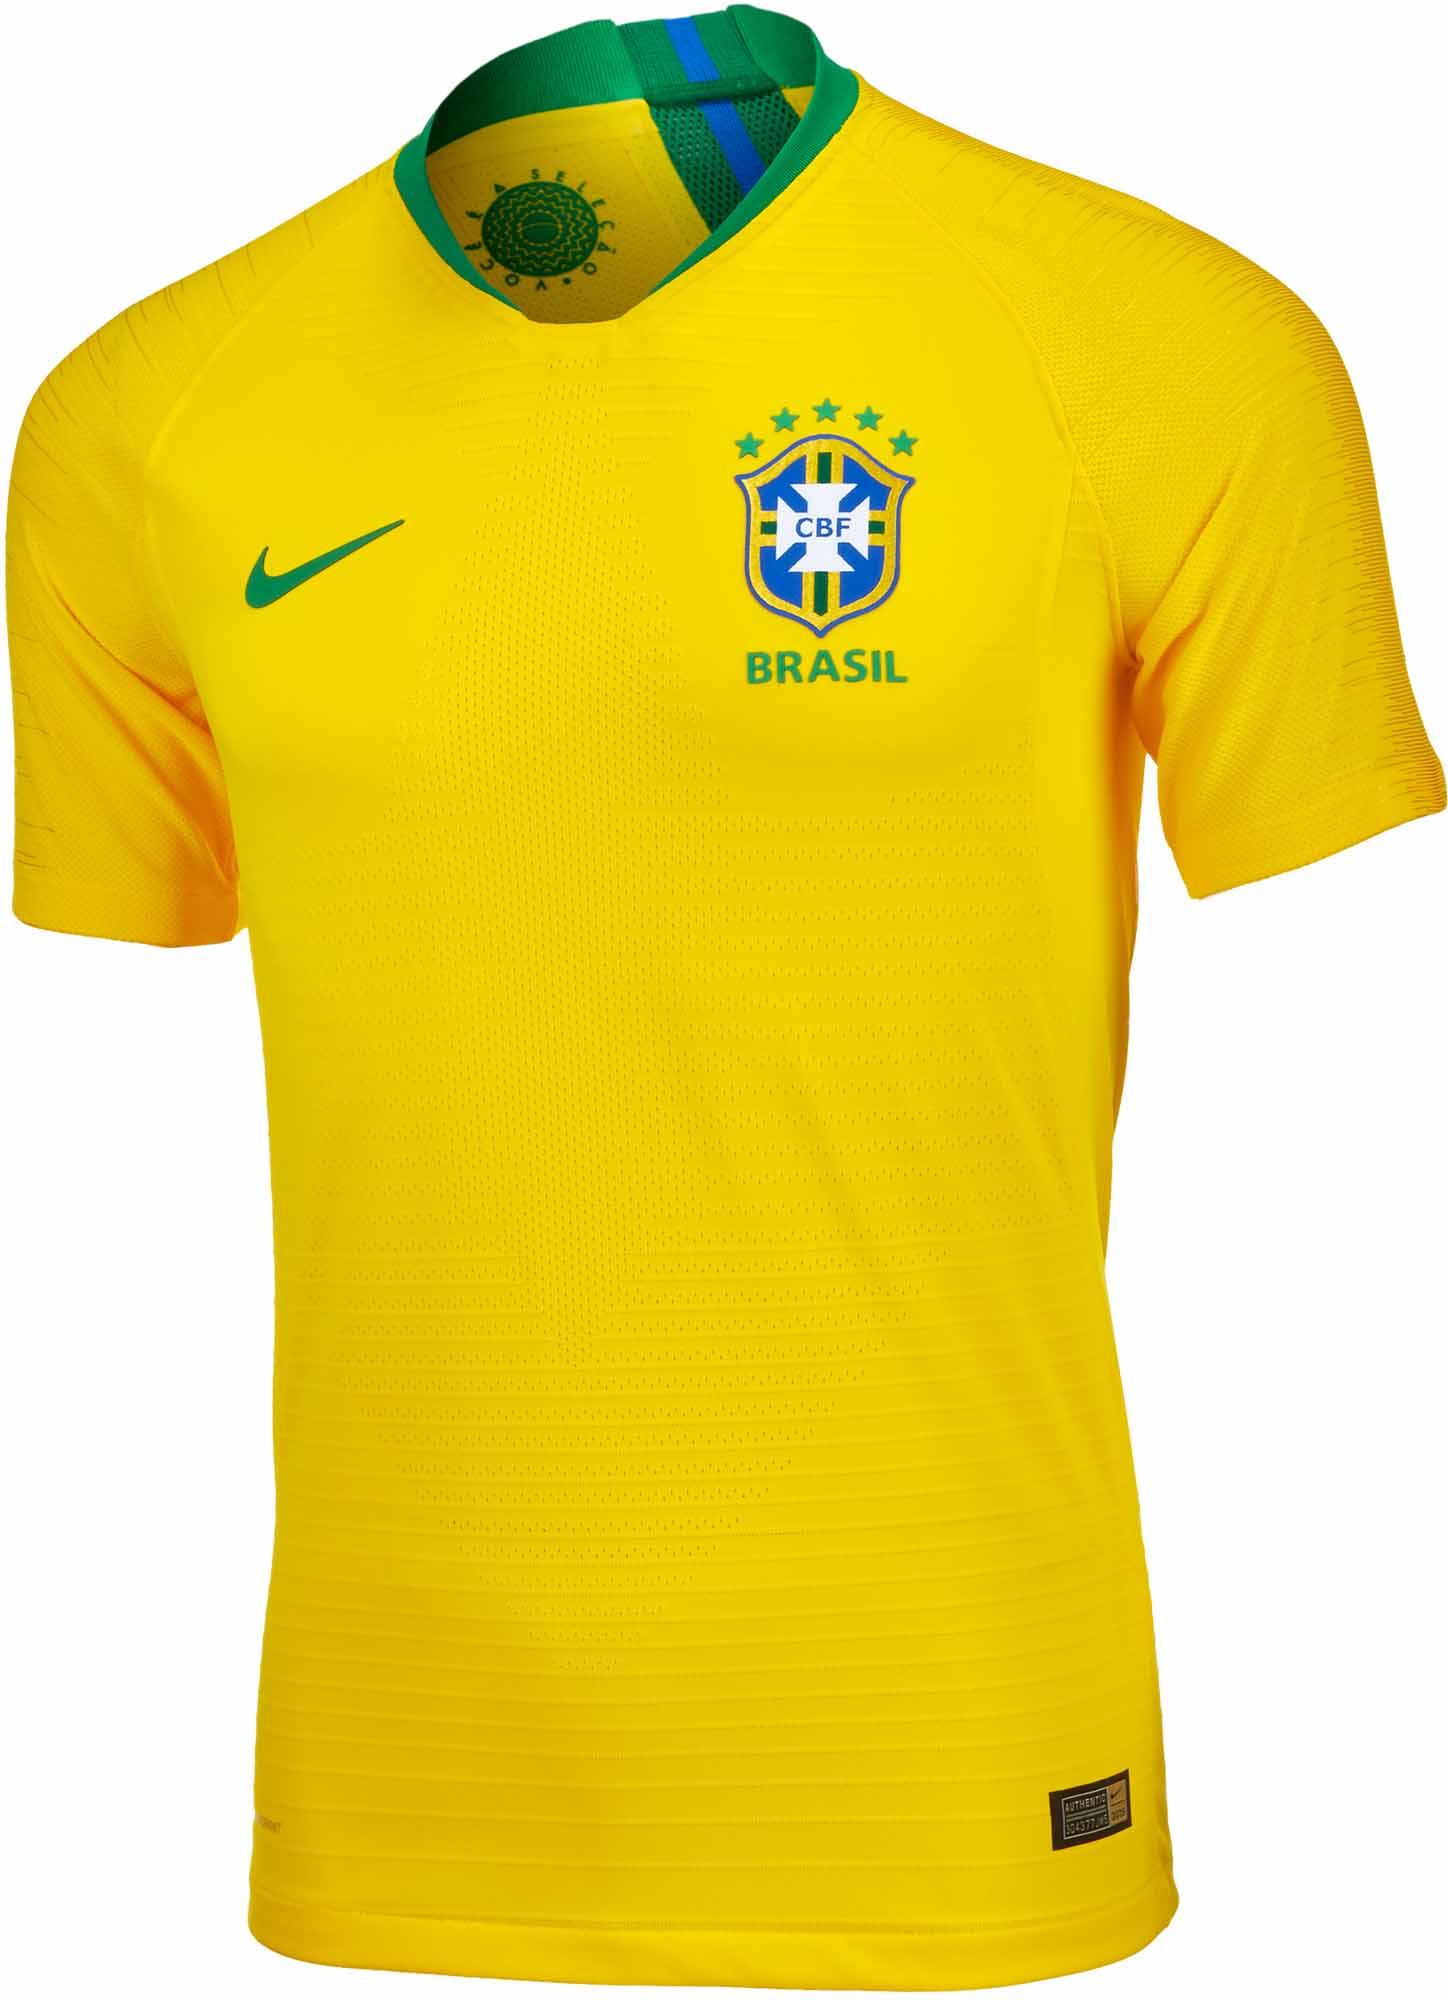 25c115dd4de 2018/19 Nike Brazil Home Authentic Jersey - Soccer Master